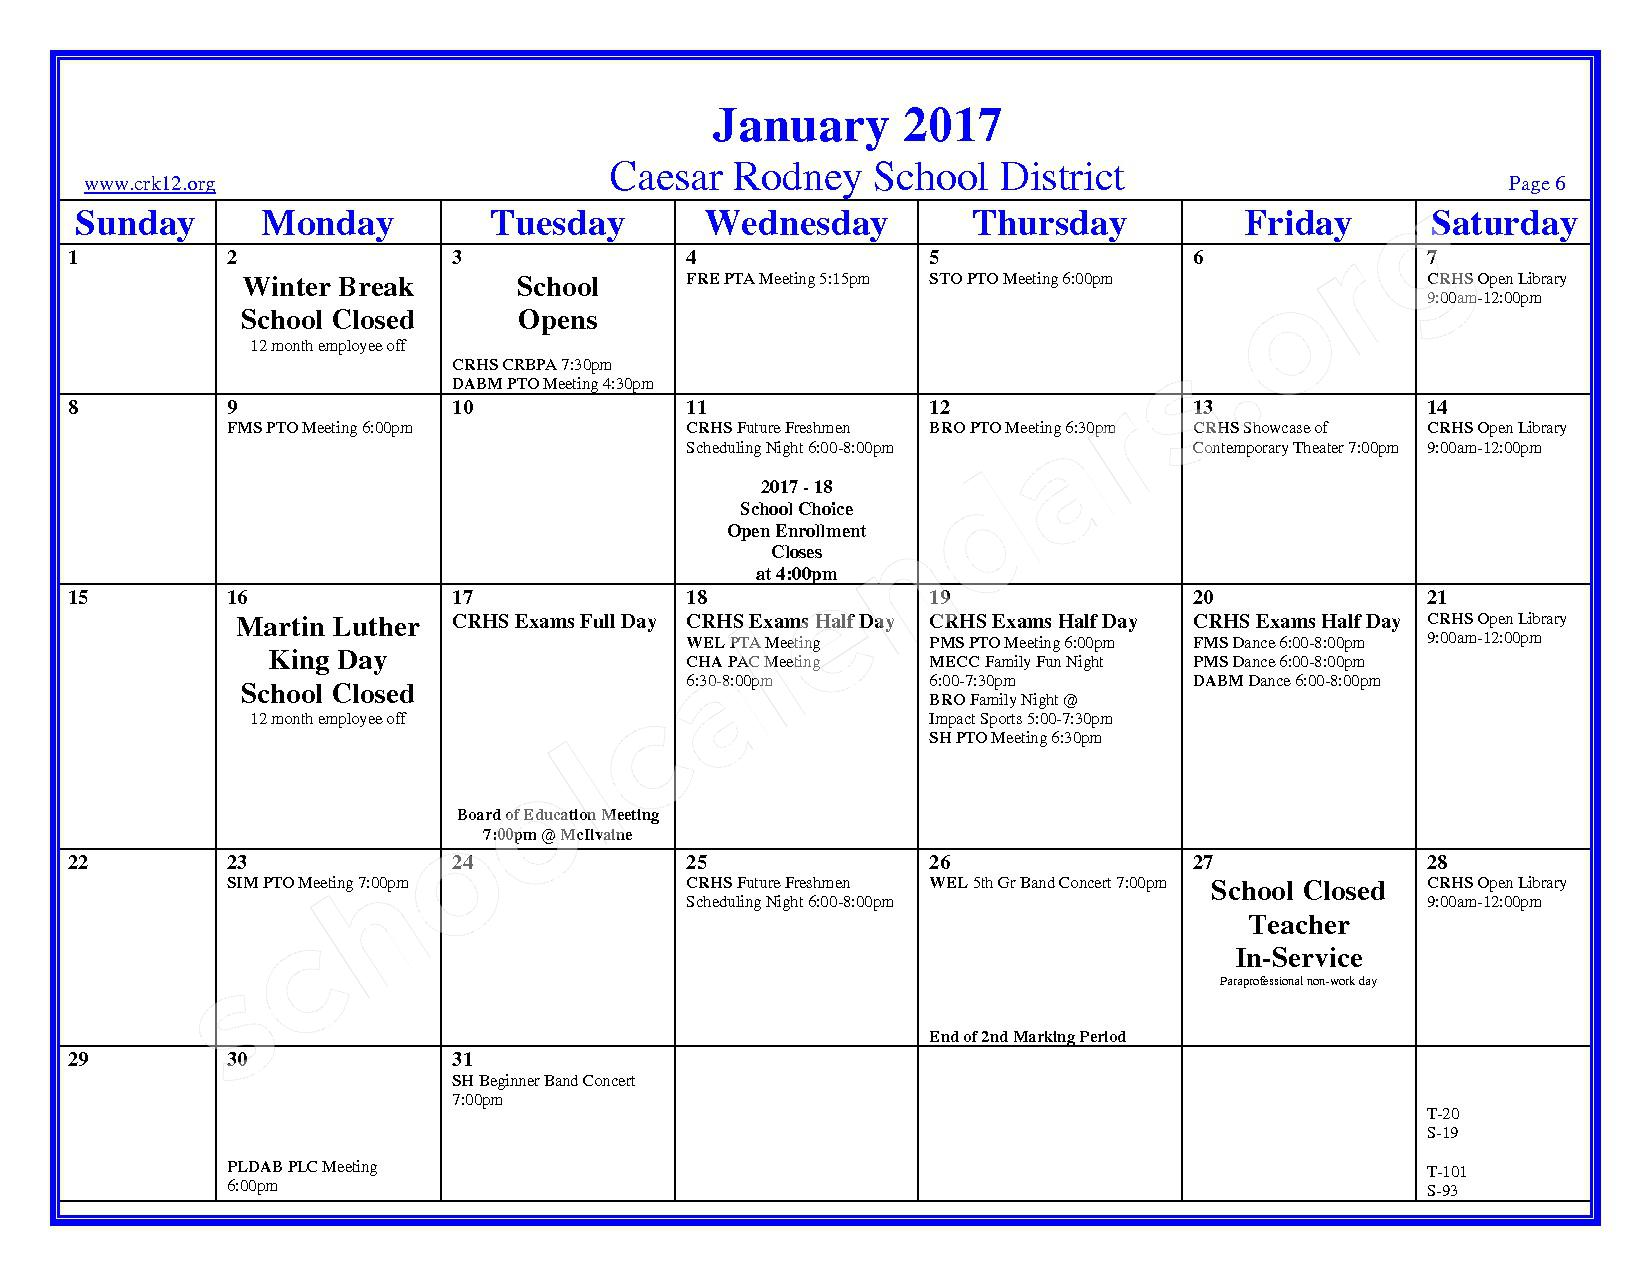 2016 - 2017 School Calendar – Brown (W. Reily) Elementary School – page 6